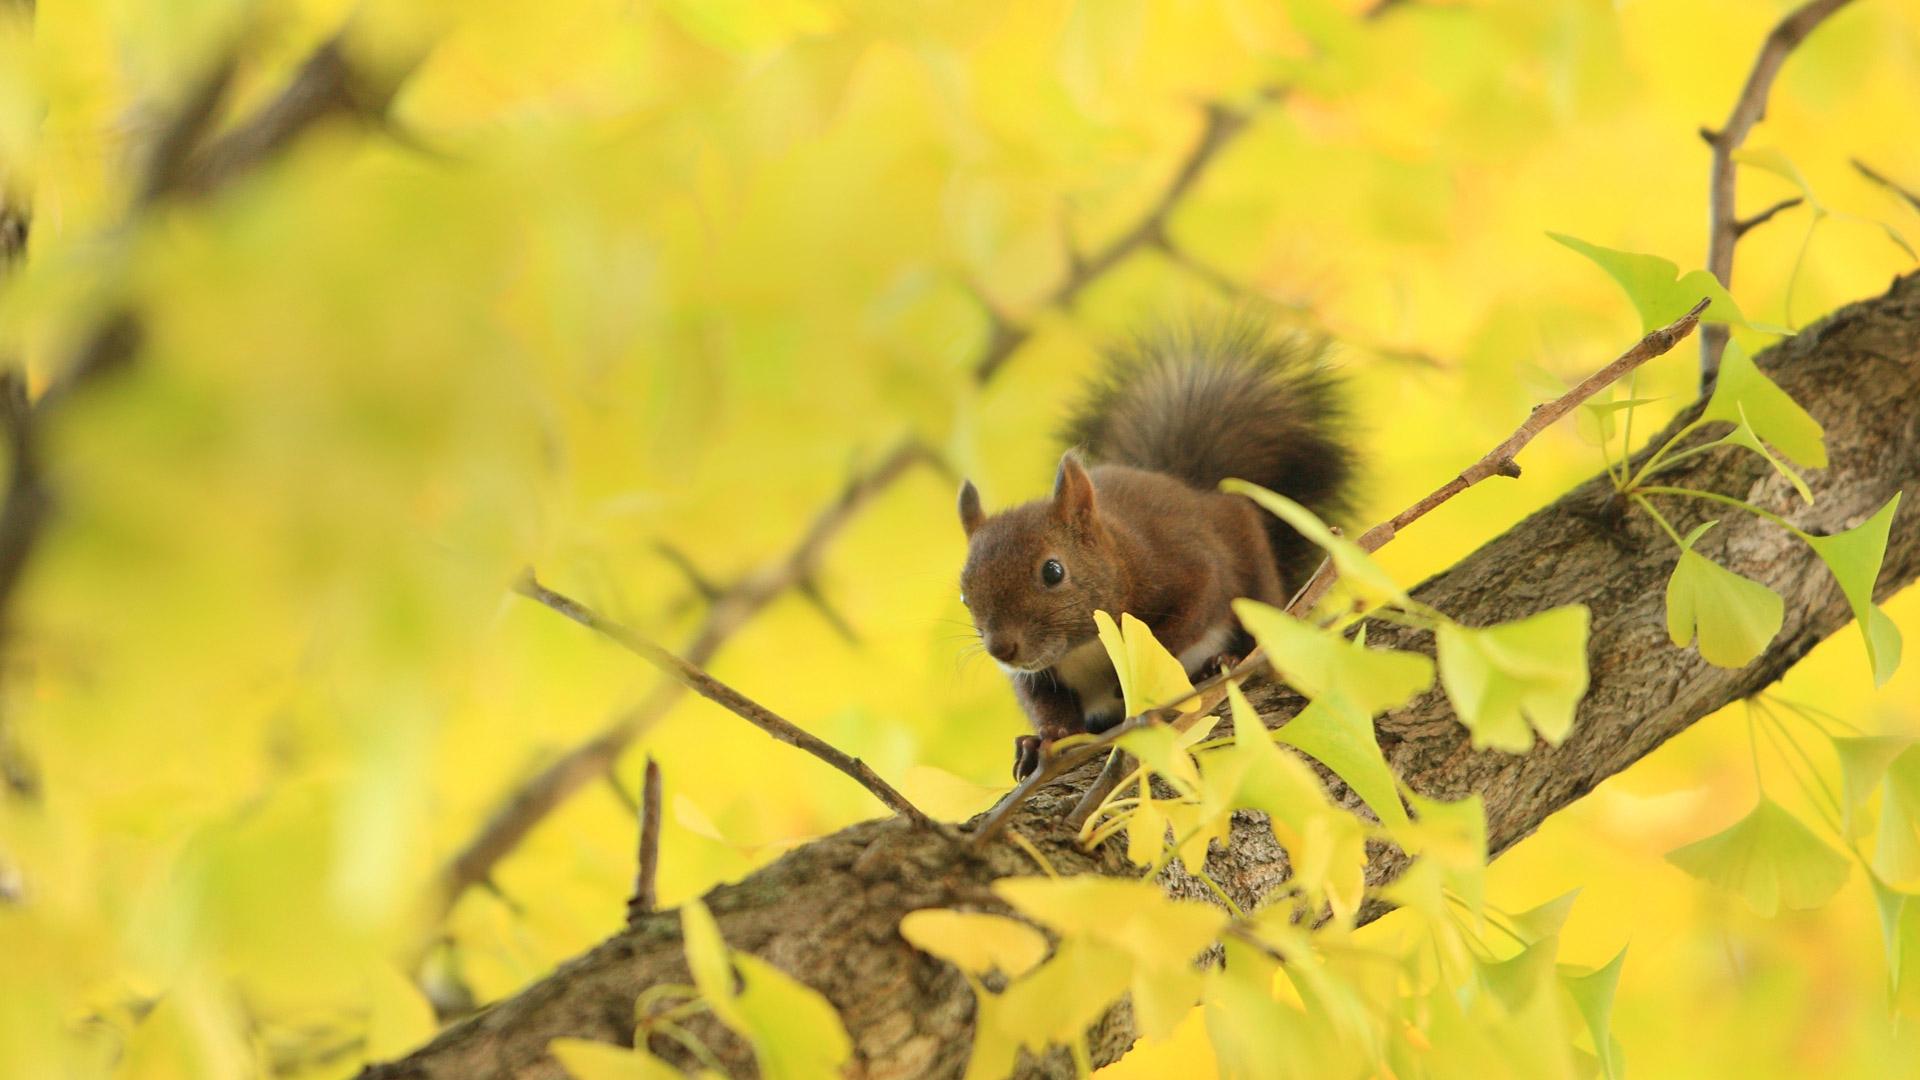 Hokk Squirrel